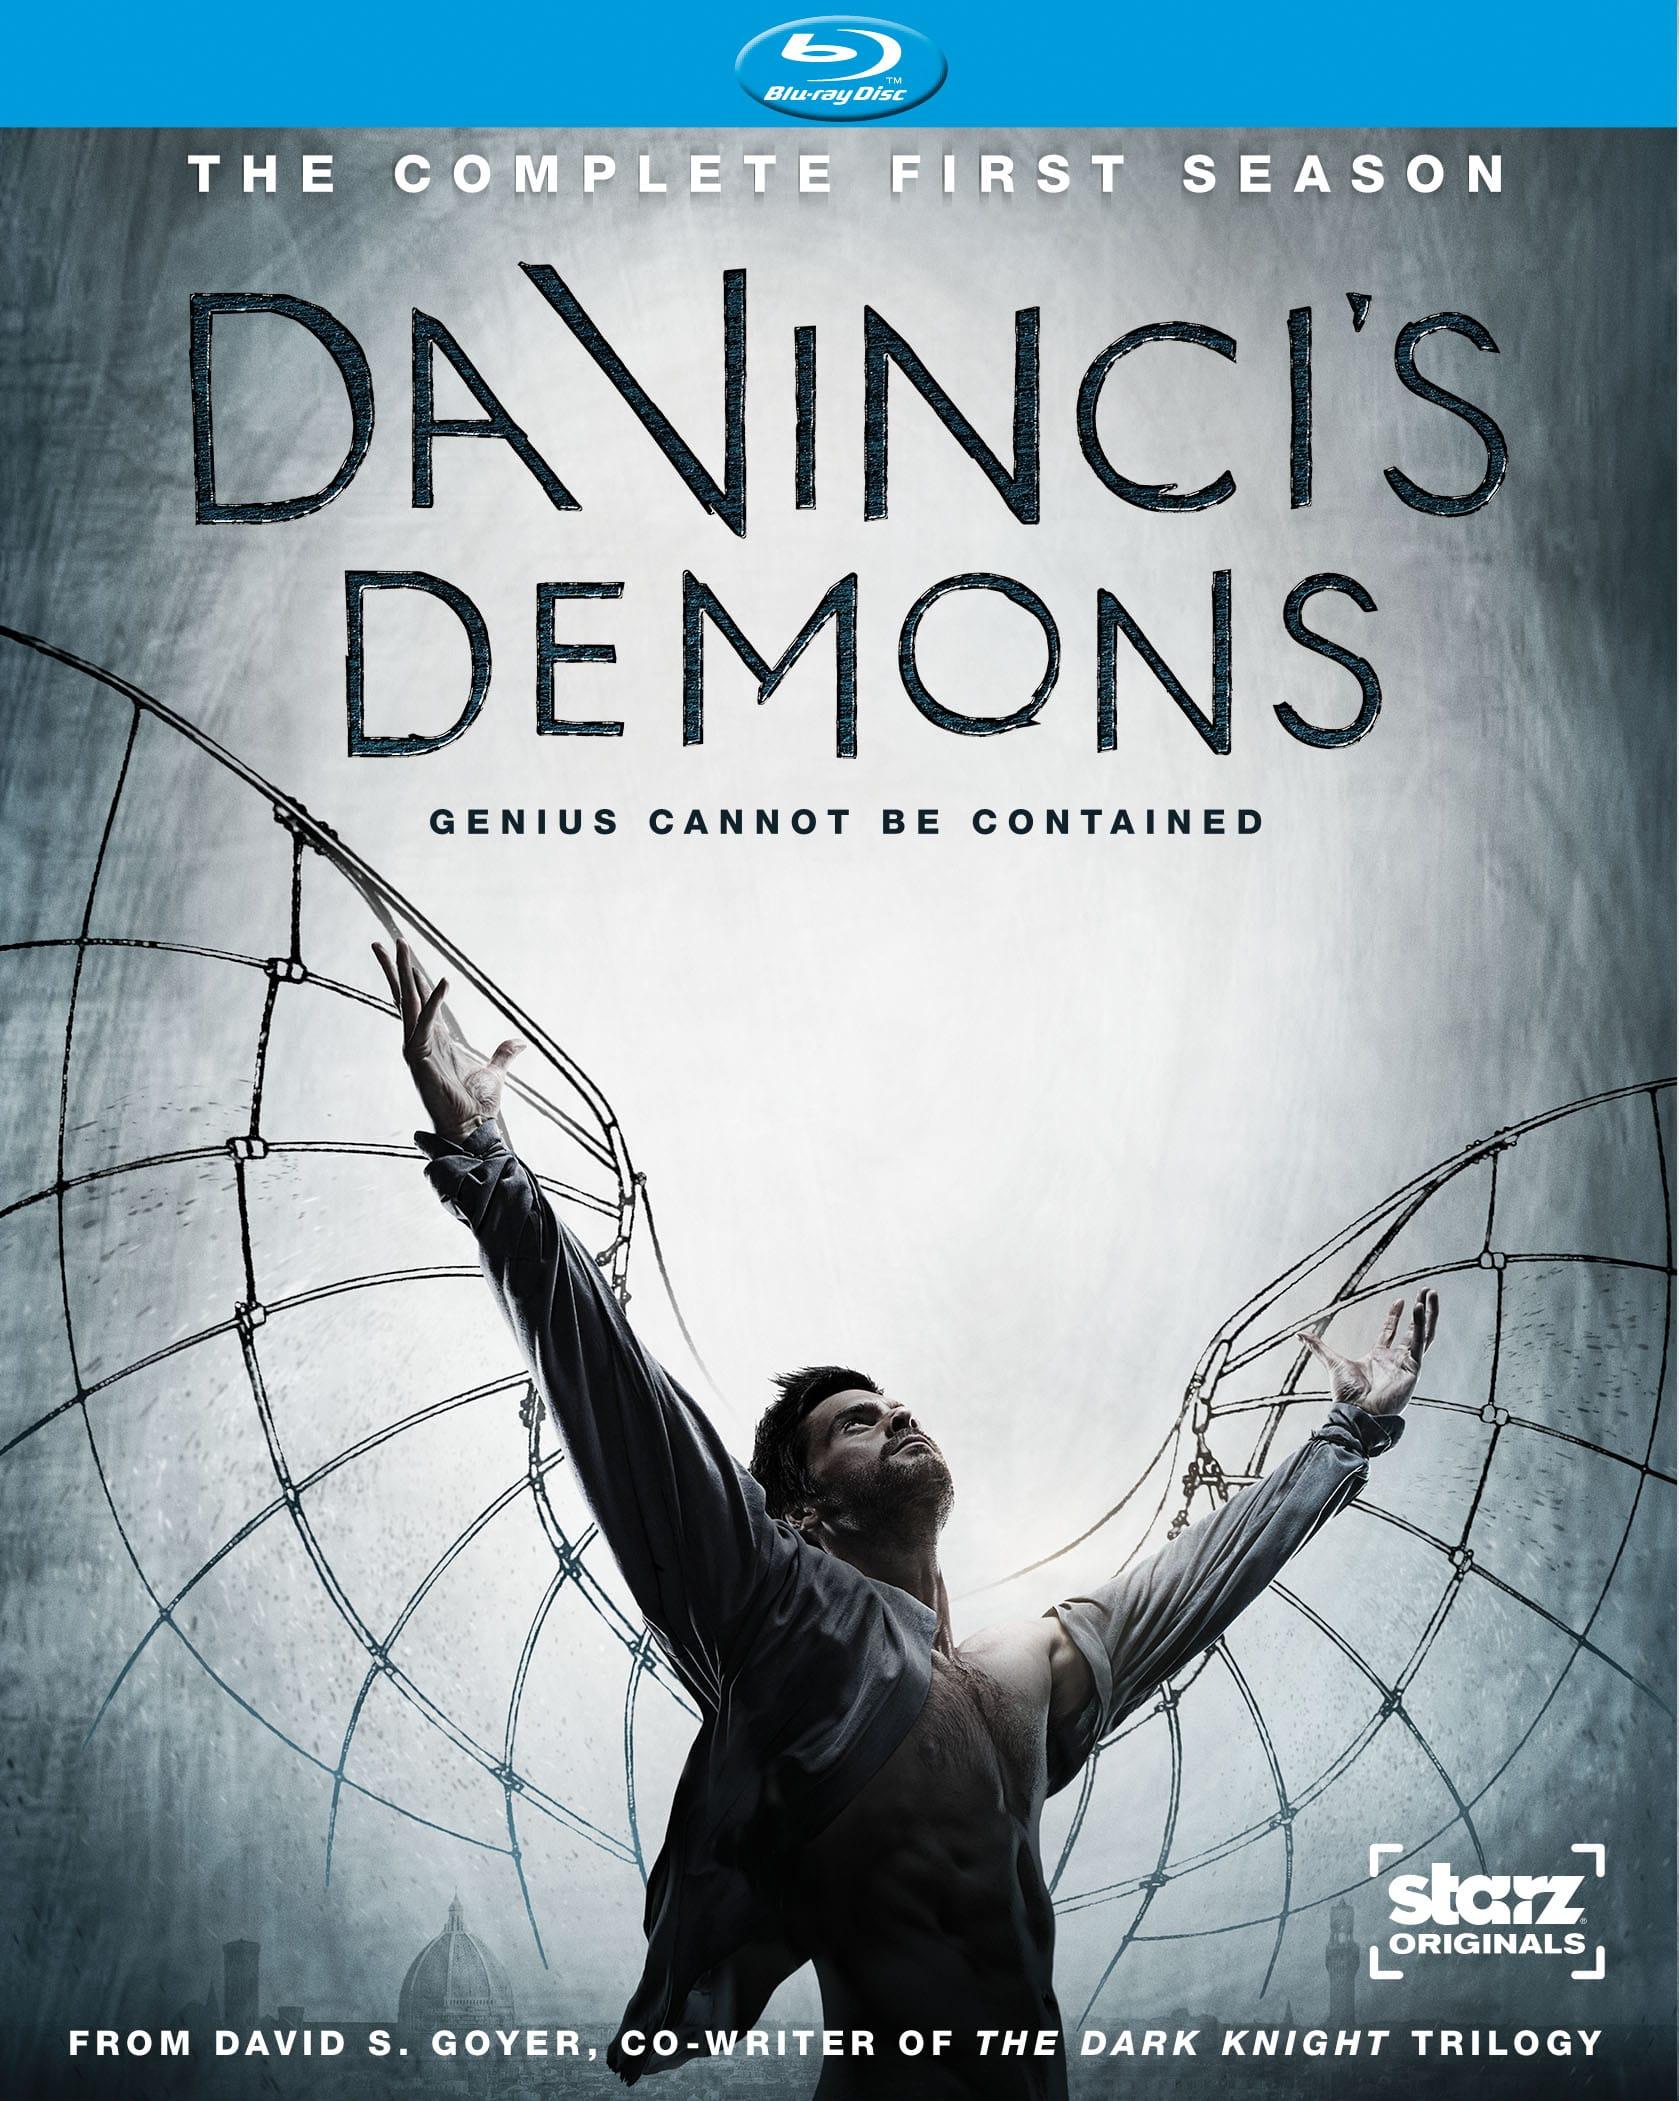 Davinci's Demons Blu-Ray